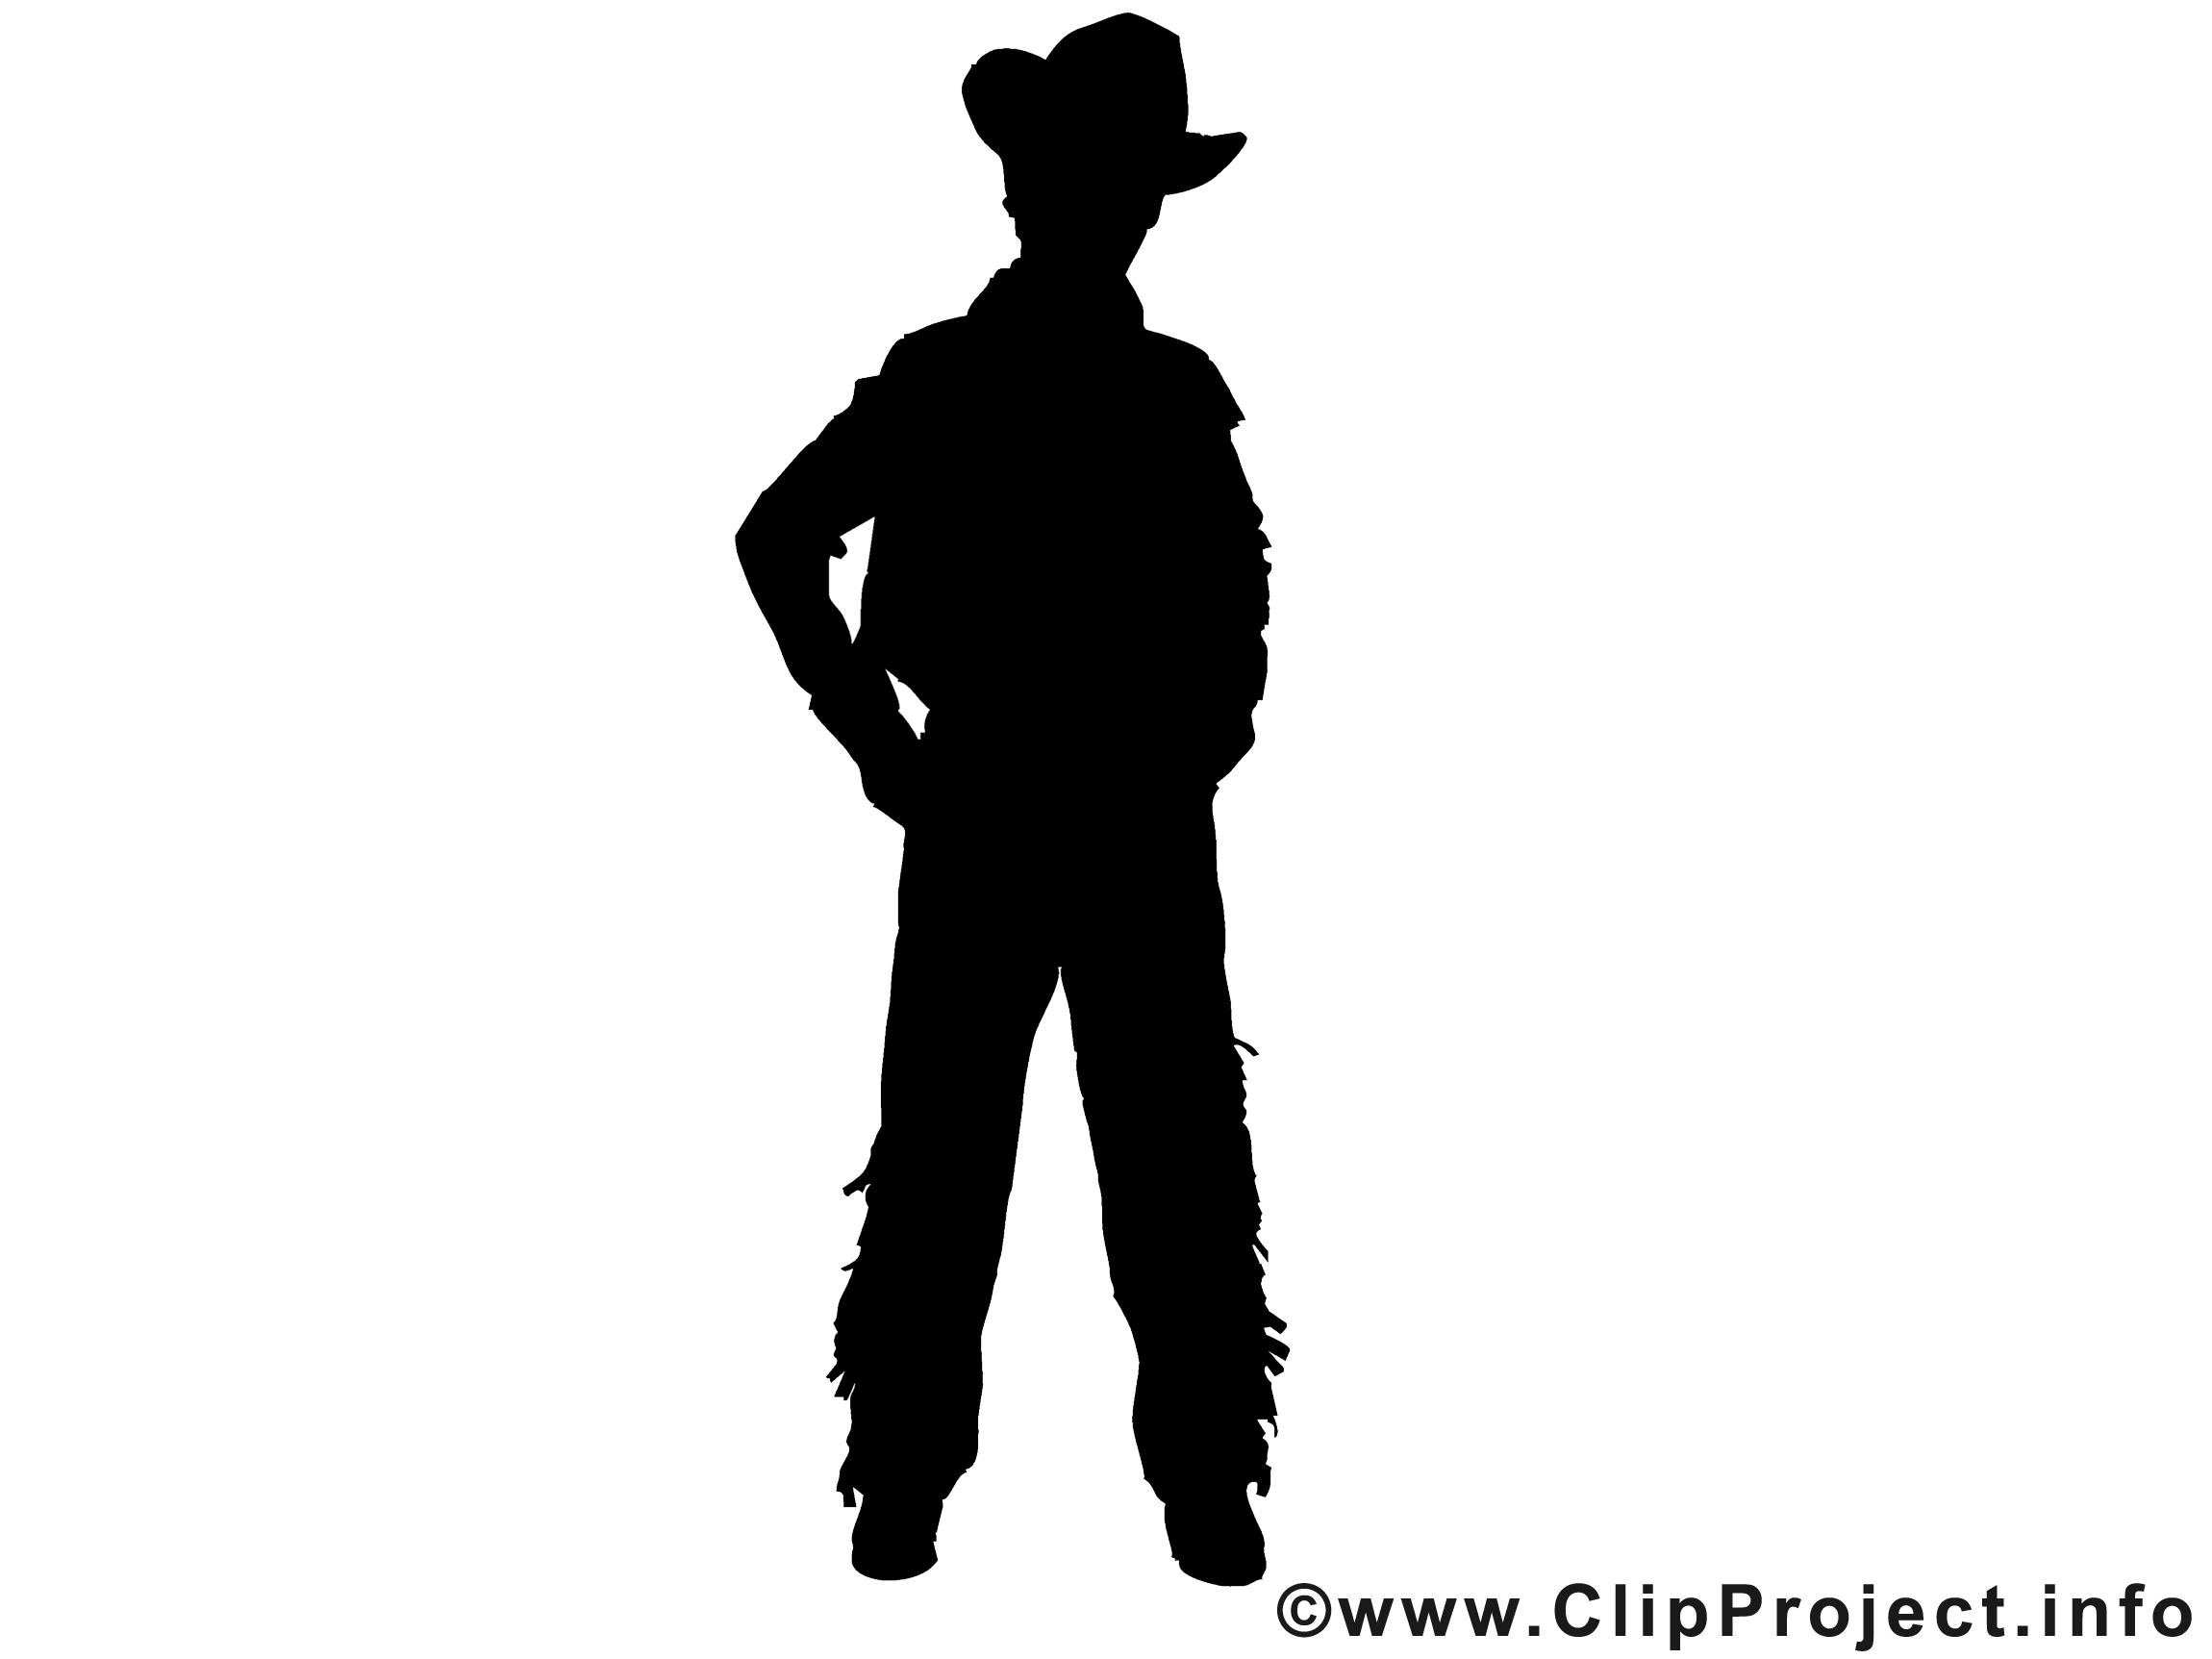 Cowboy Silhouette Clipart - Clipart Kid